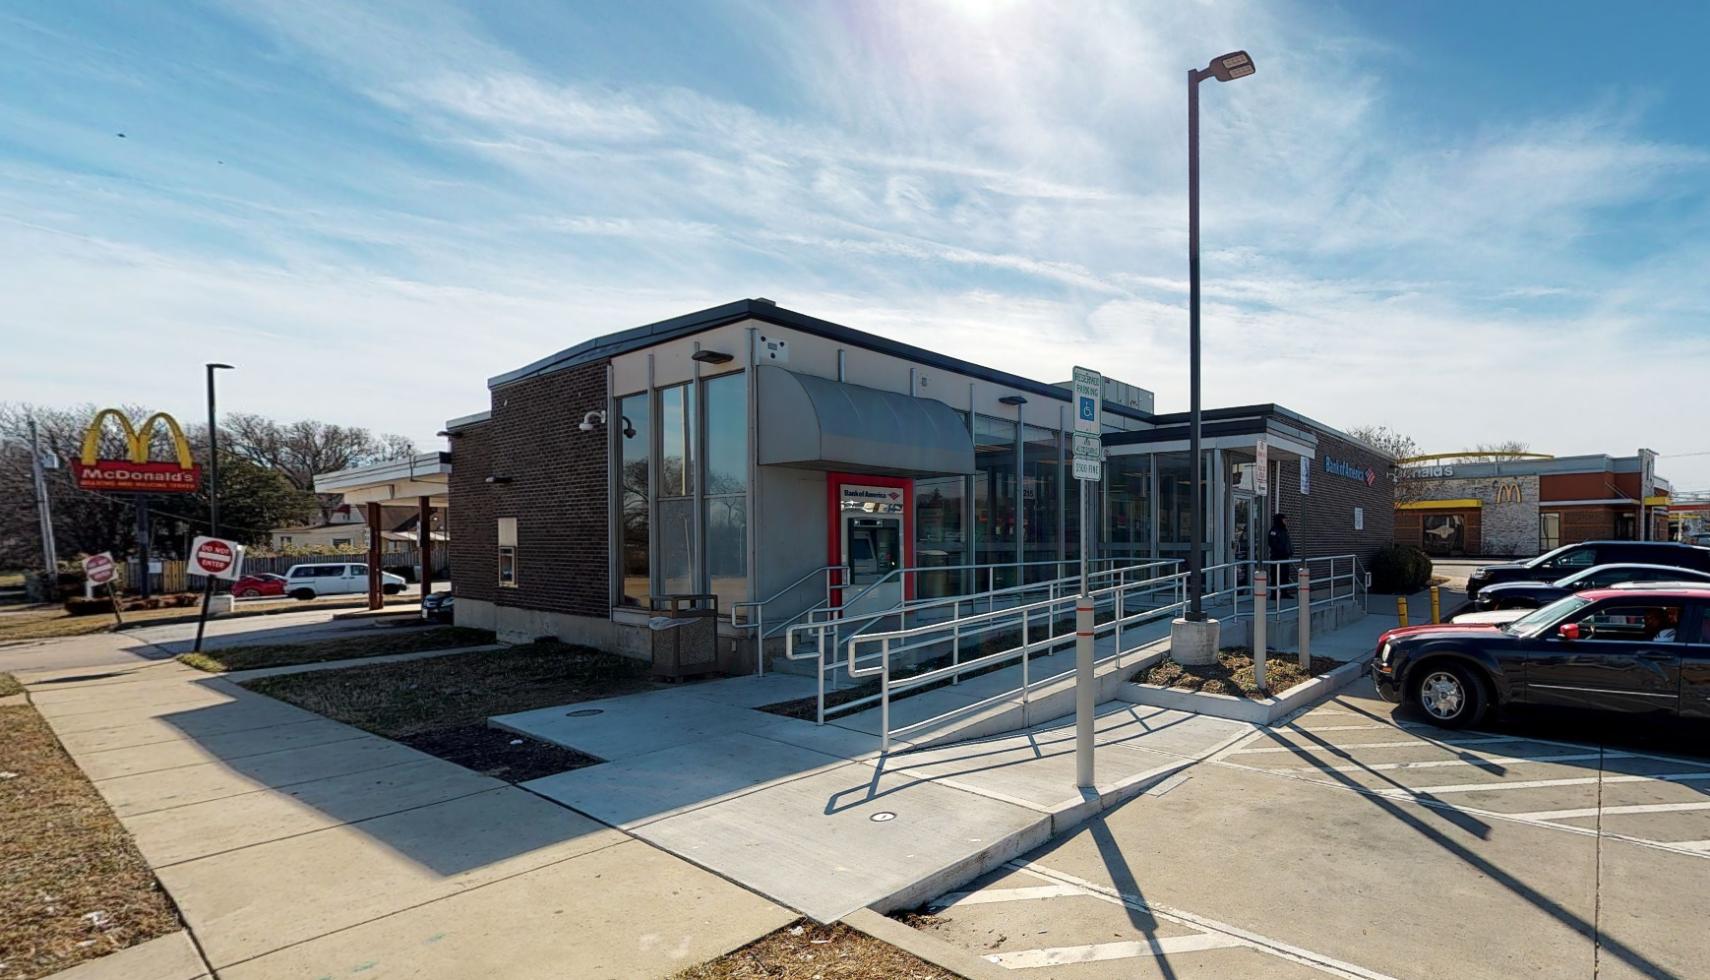 Bank of America financial center with drive-thru ATM | 3215 Washington Blvd, Baltimore, MD 21230